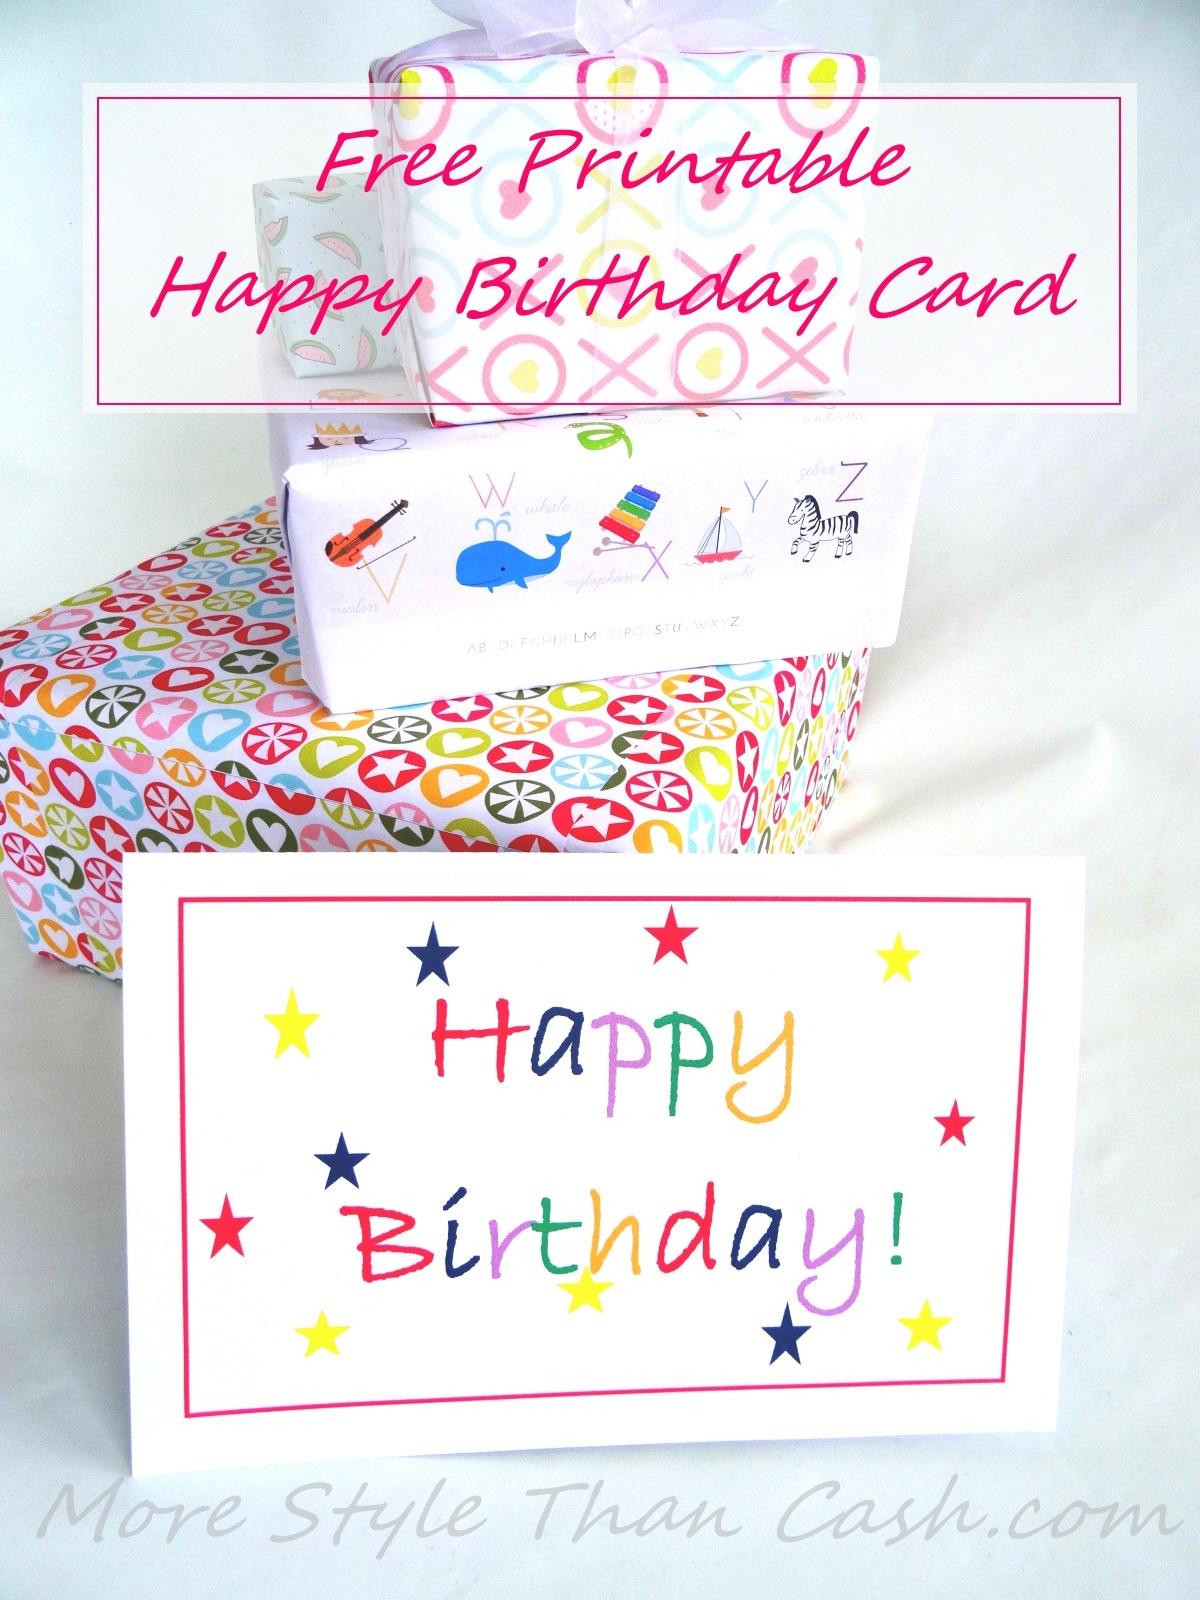 Free Printable Birthday Card - Free Printable Birthday Cards For Wife